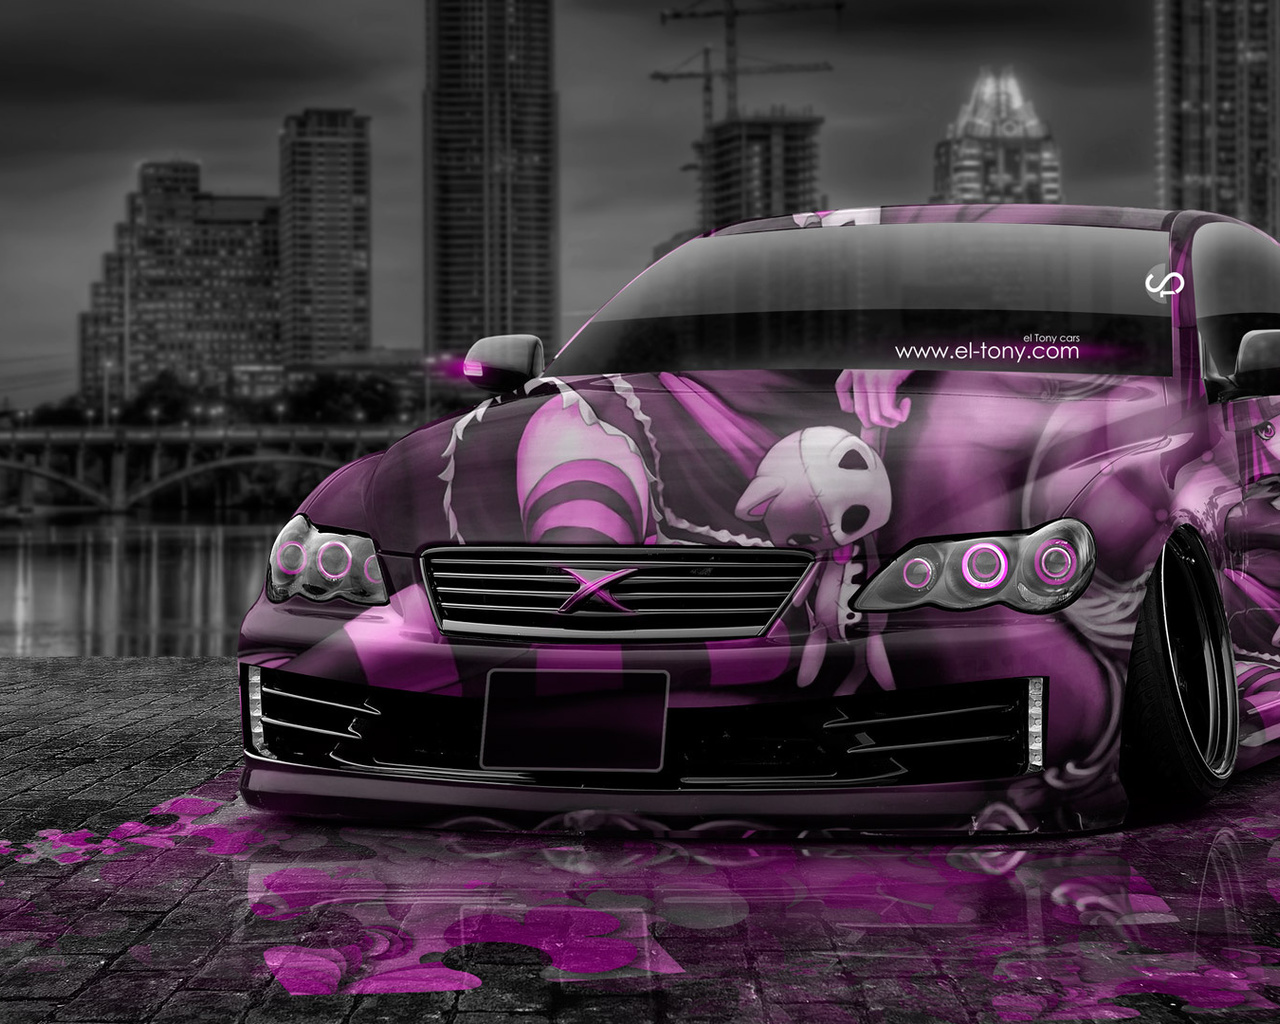 tony kokhan, toyota, mark, x, jdm, tuning, anime, aerography, girl, city, pink, colors, style, el tony cars, photoshop, hd wallpapers, тони кохан, фотошоп, тойота, марк, х, икс, тюнинг, аэрография, аниме, анимэ, город, ночь, розовая, машина, розовое, авто